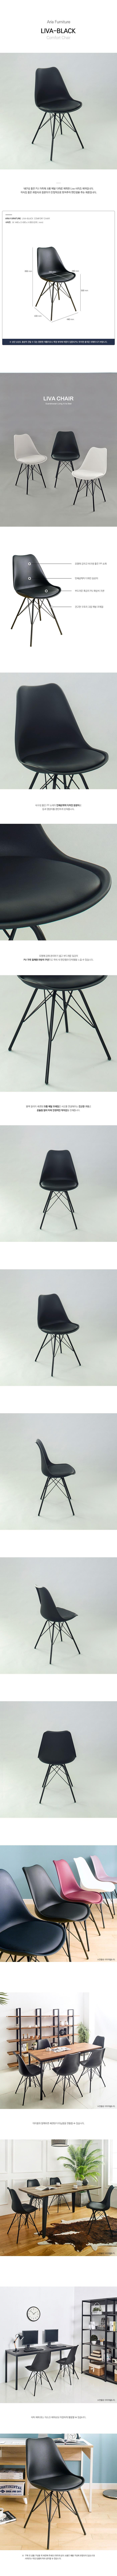 4_9_Liva-dining-Chair-Black.jpg